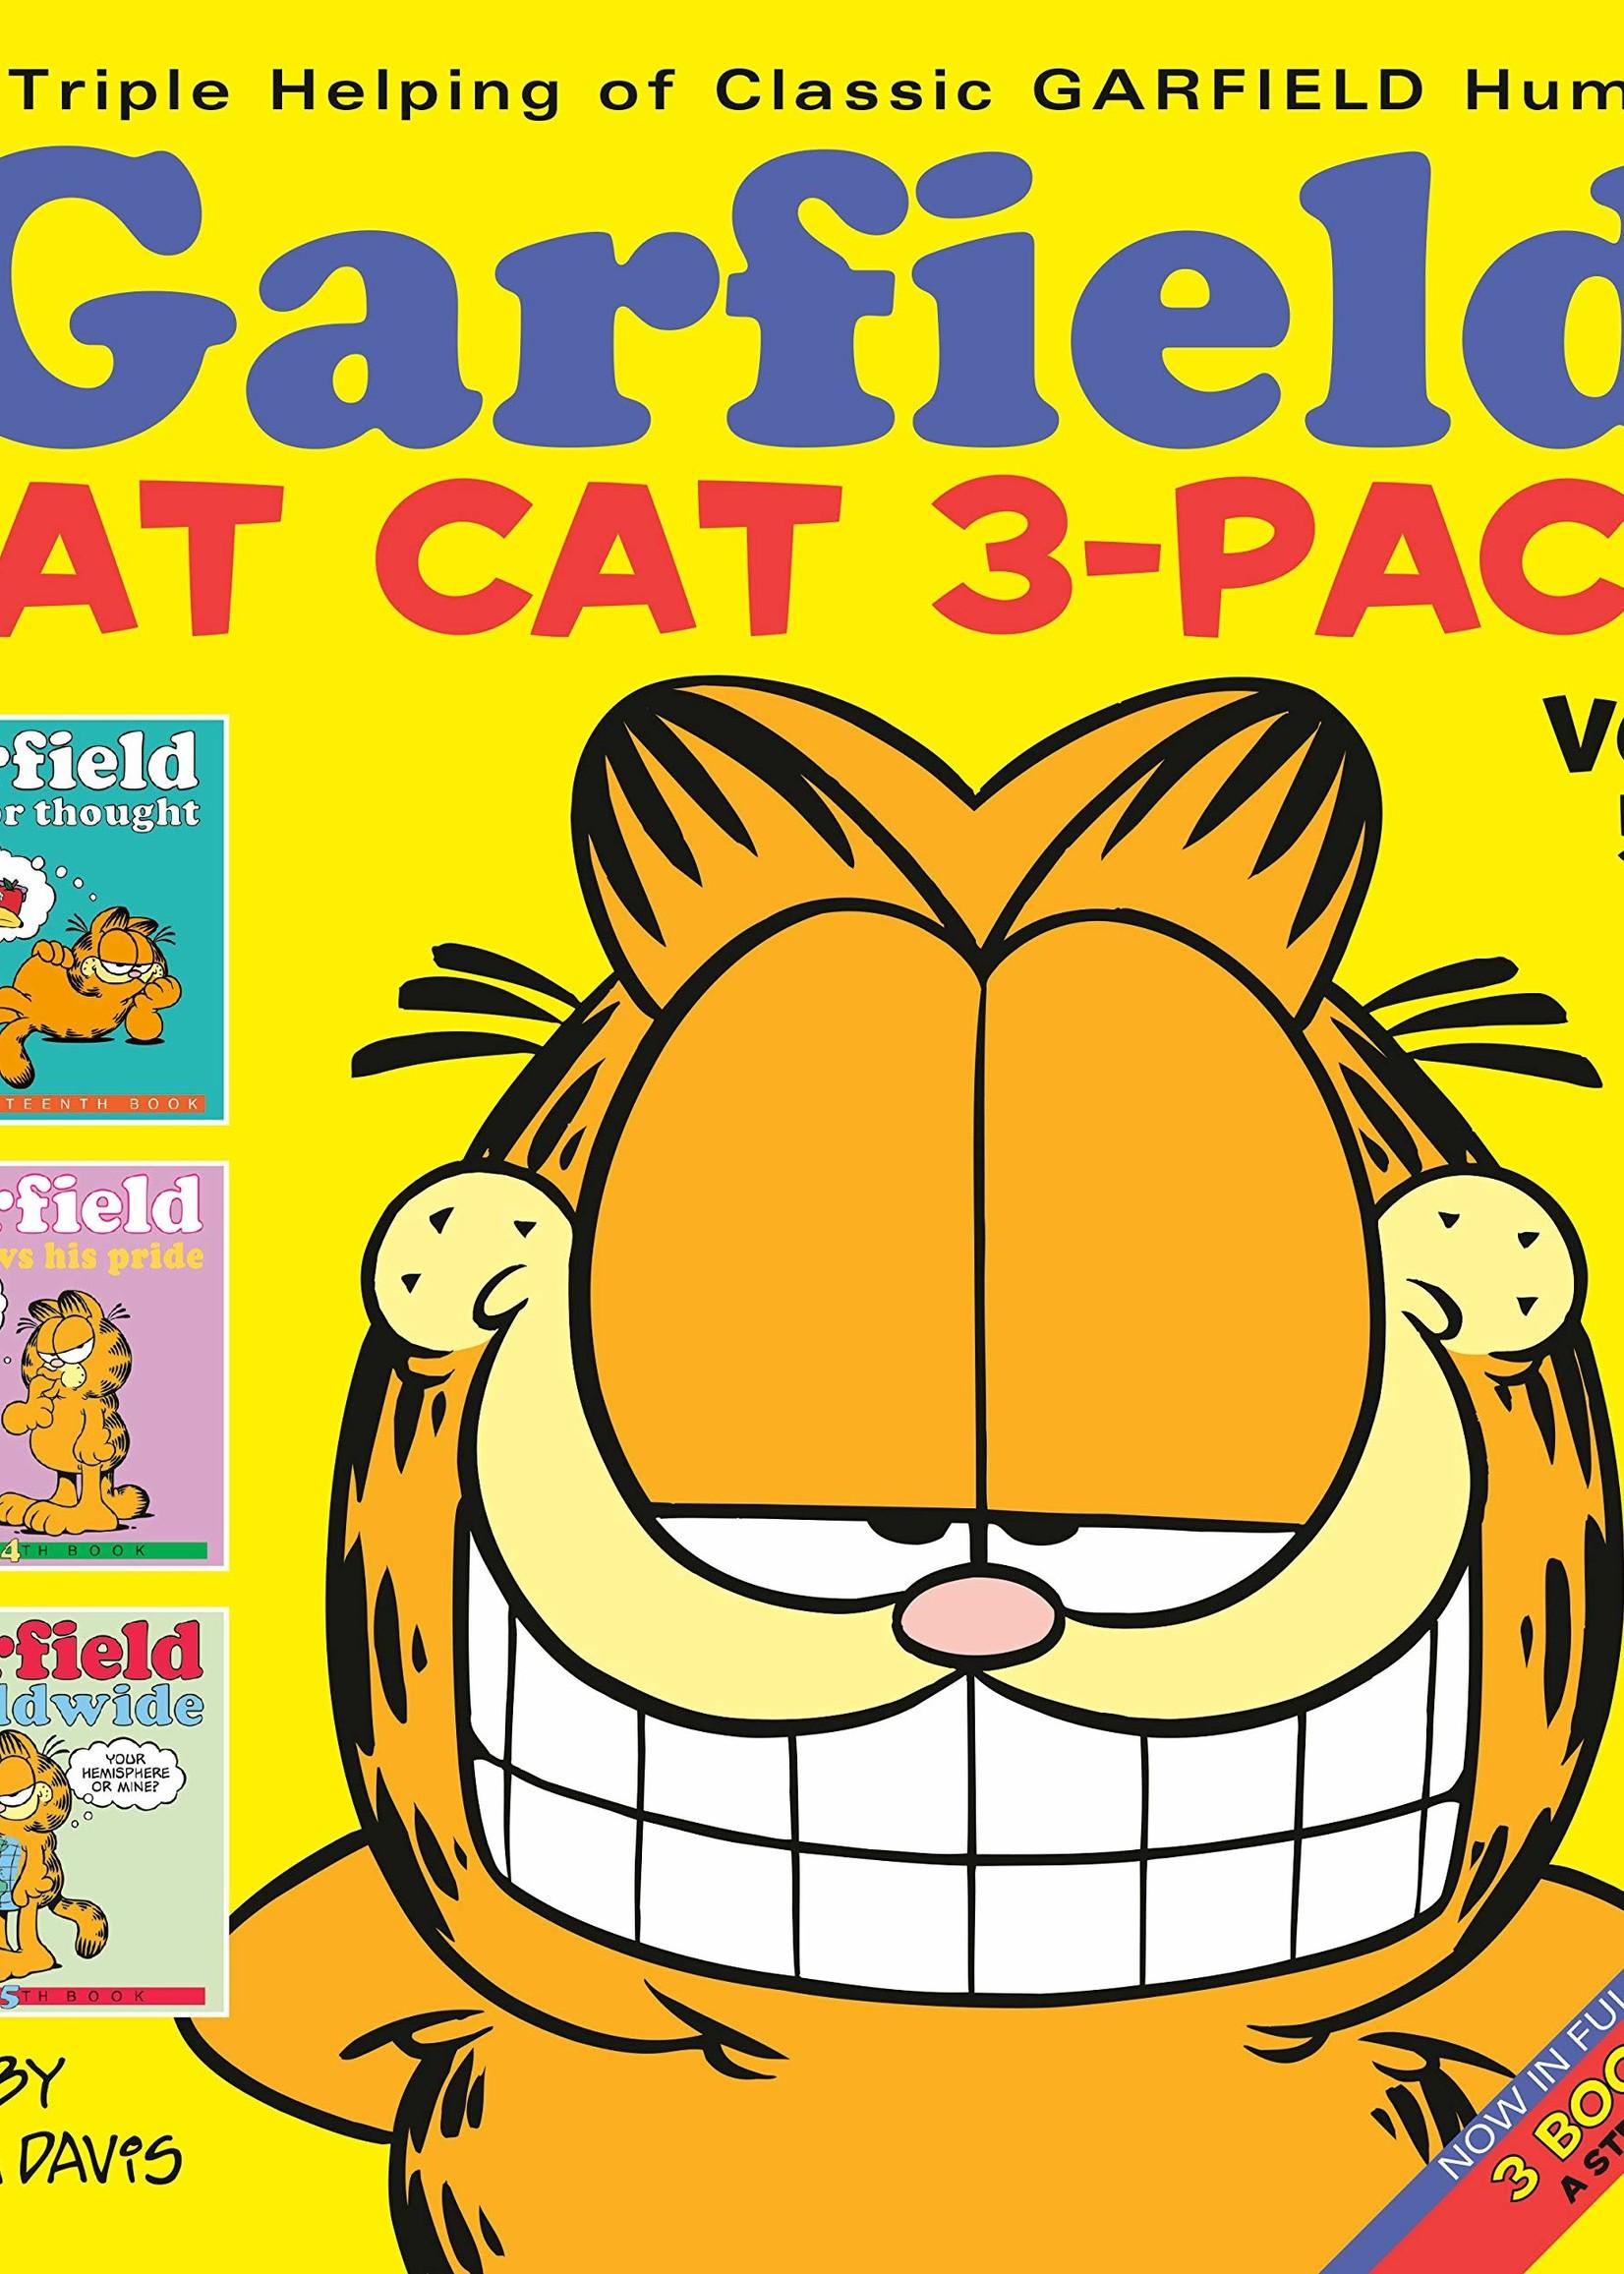 Garfield Fat Cat 3-Pack #05 - Paperback